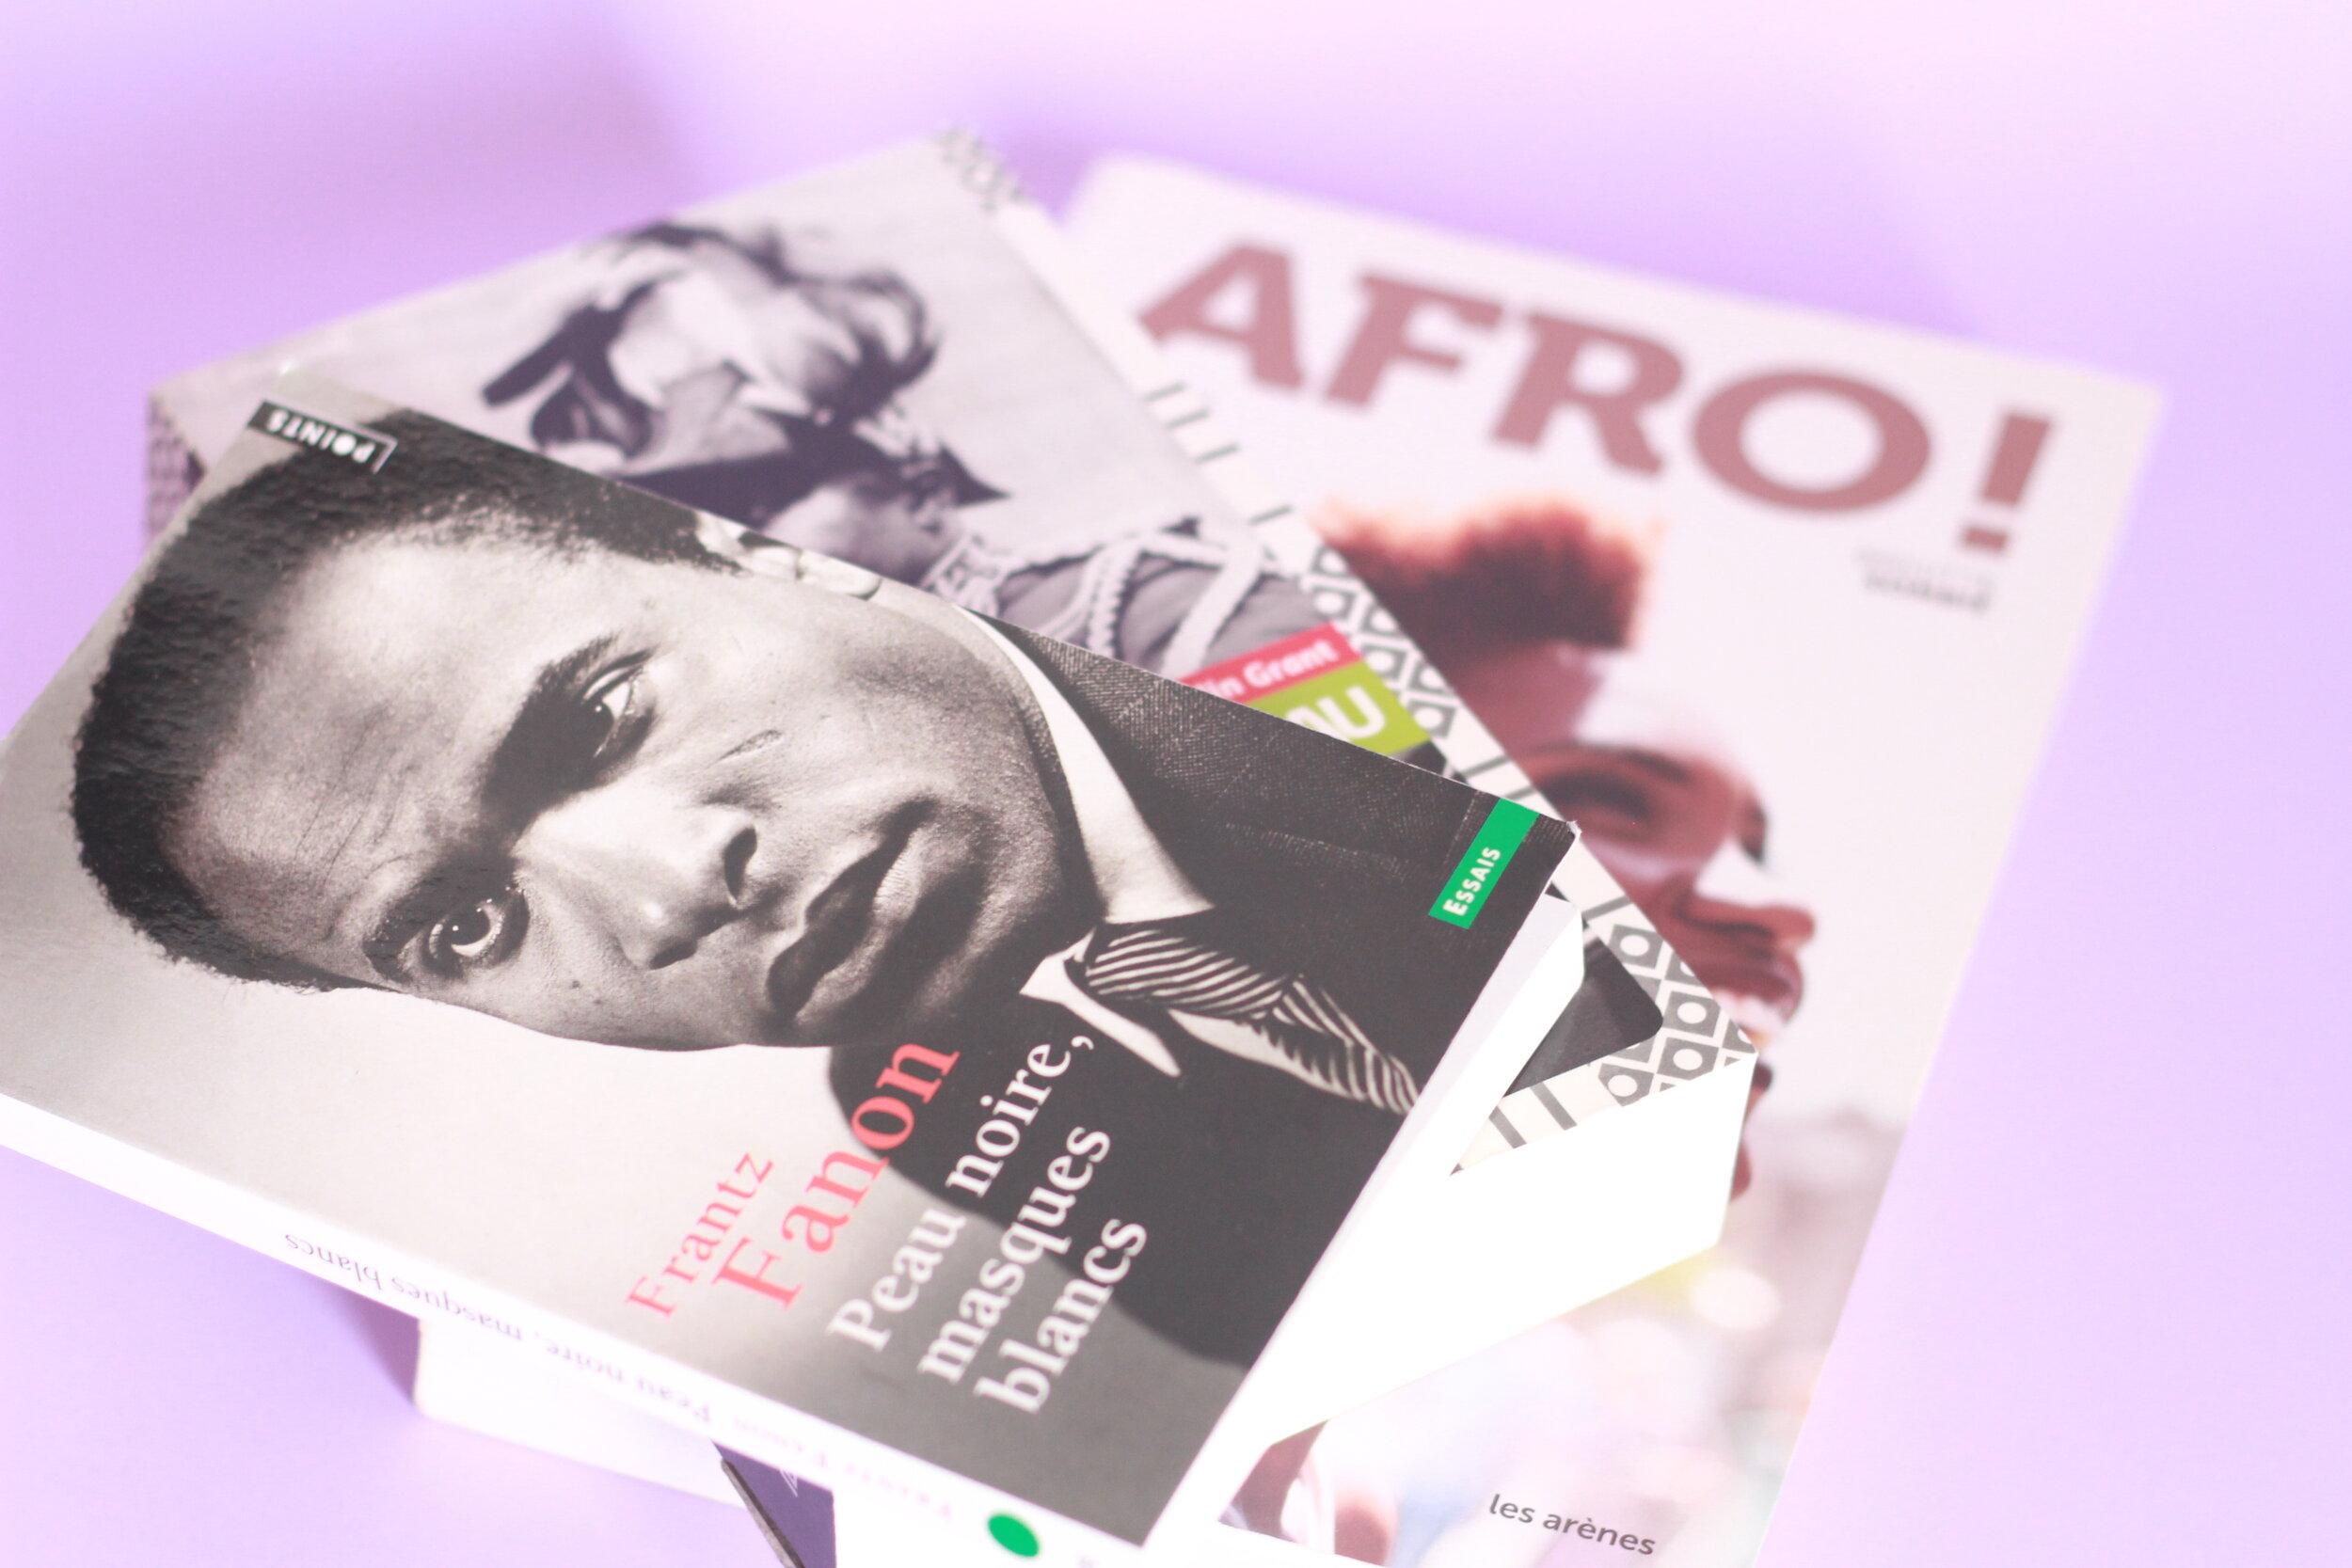 livre-histoire-cheveu-afro-curls lab.JPG